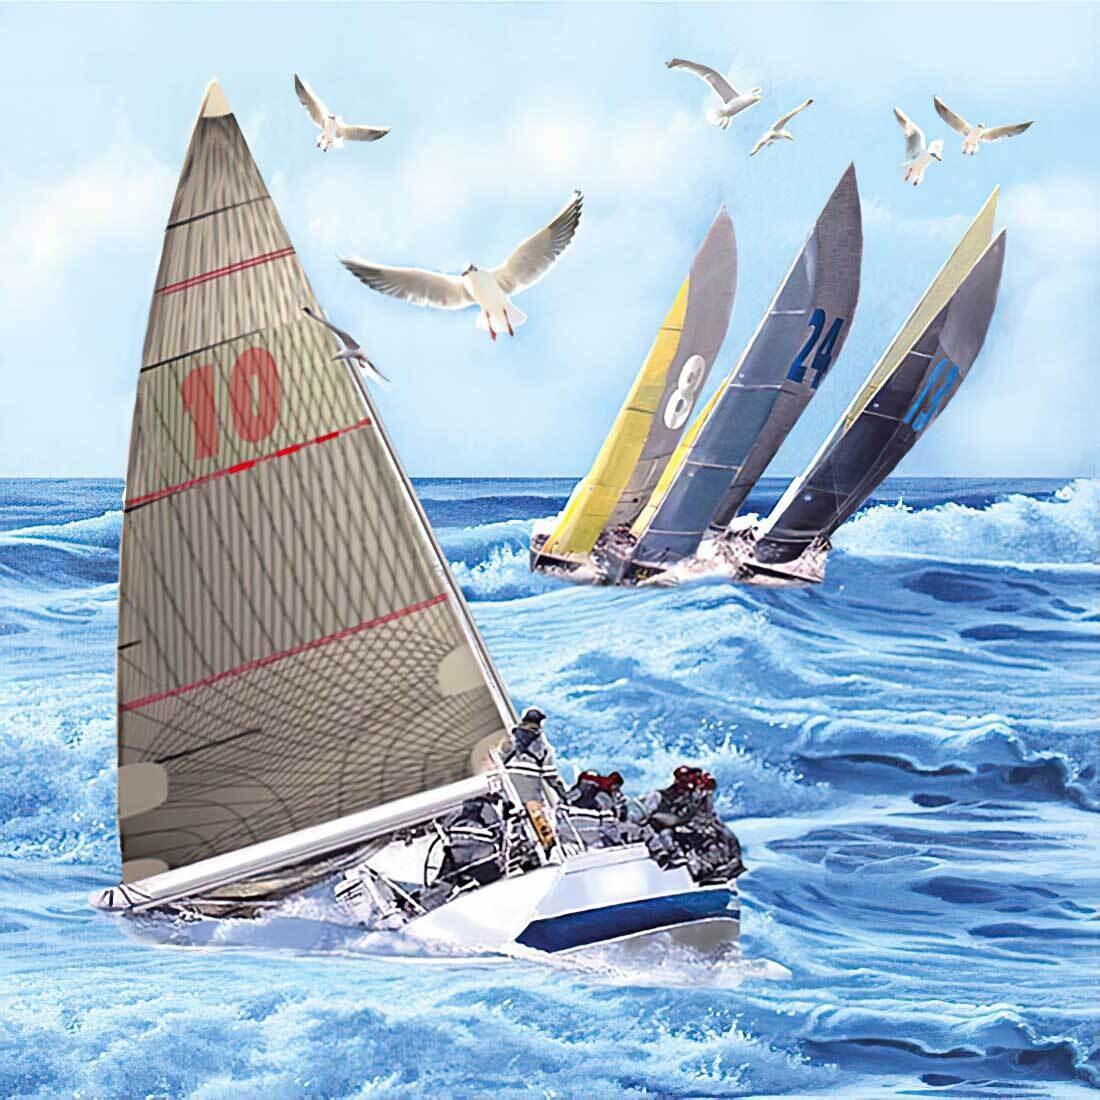 Decoupage Paper Napkins - Sail Boats 13x13 (1 Sheet)